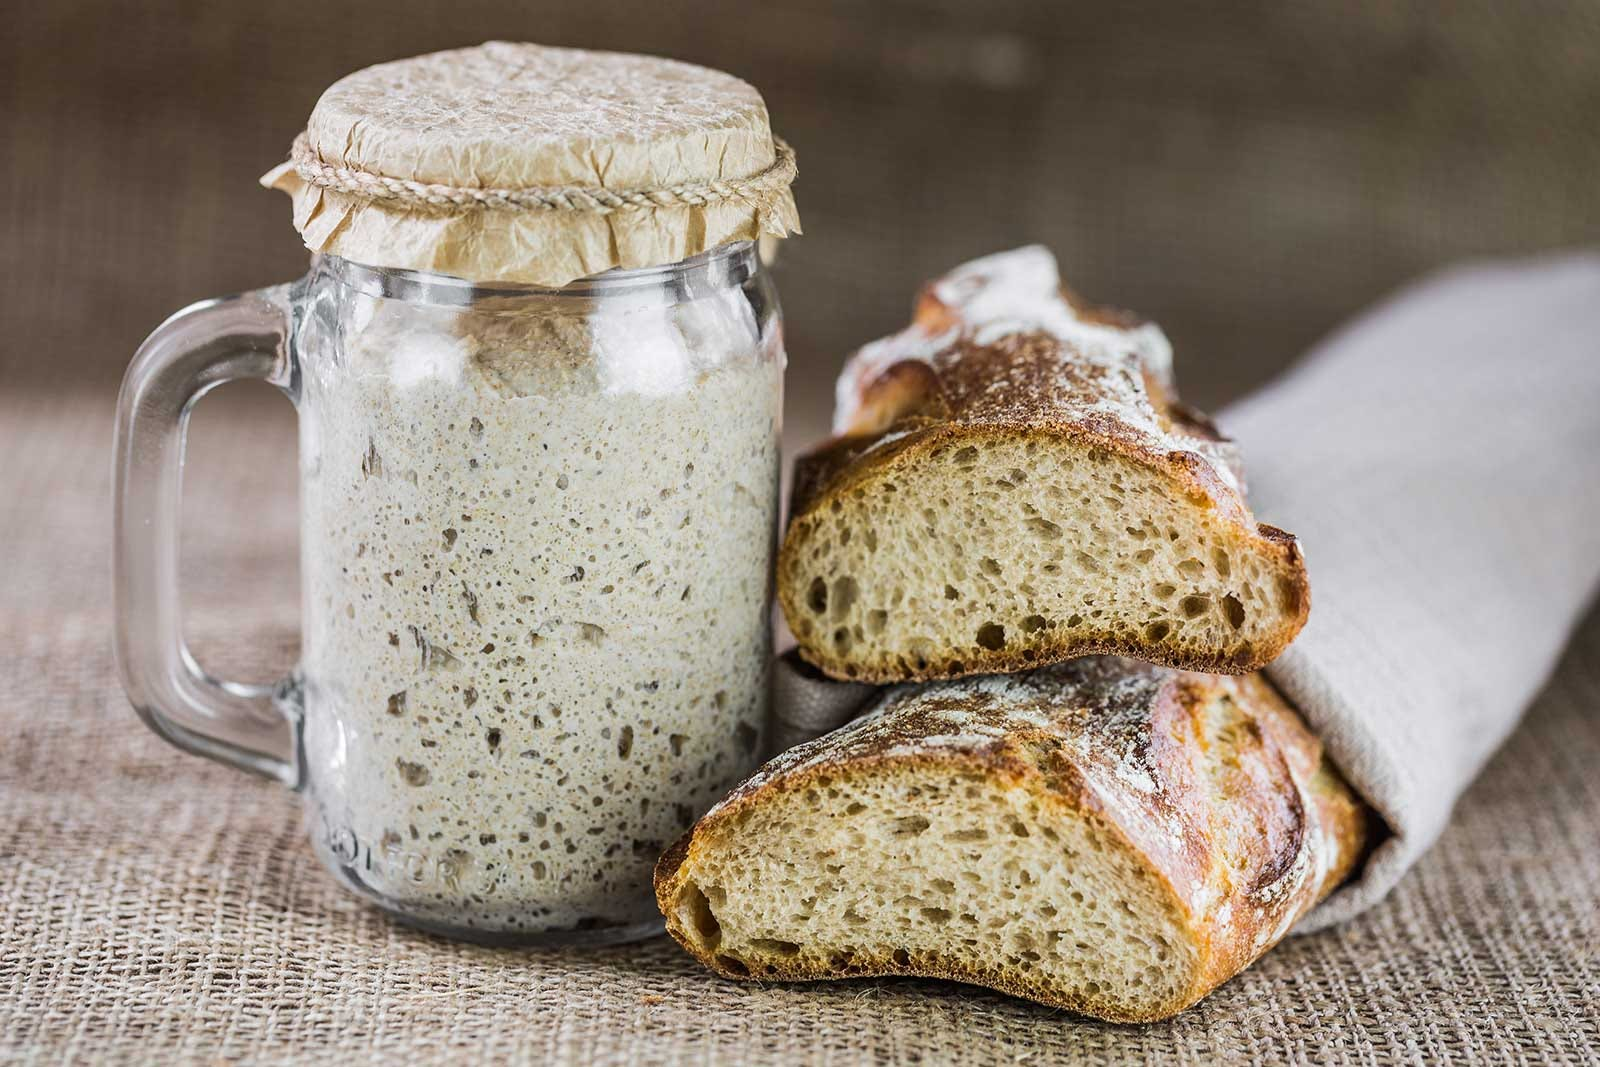 A jar of sourdough starter sitting next to some sourdough baguettes.